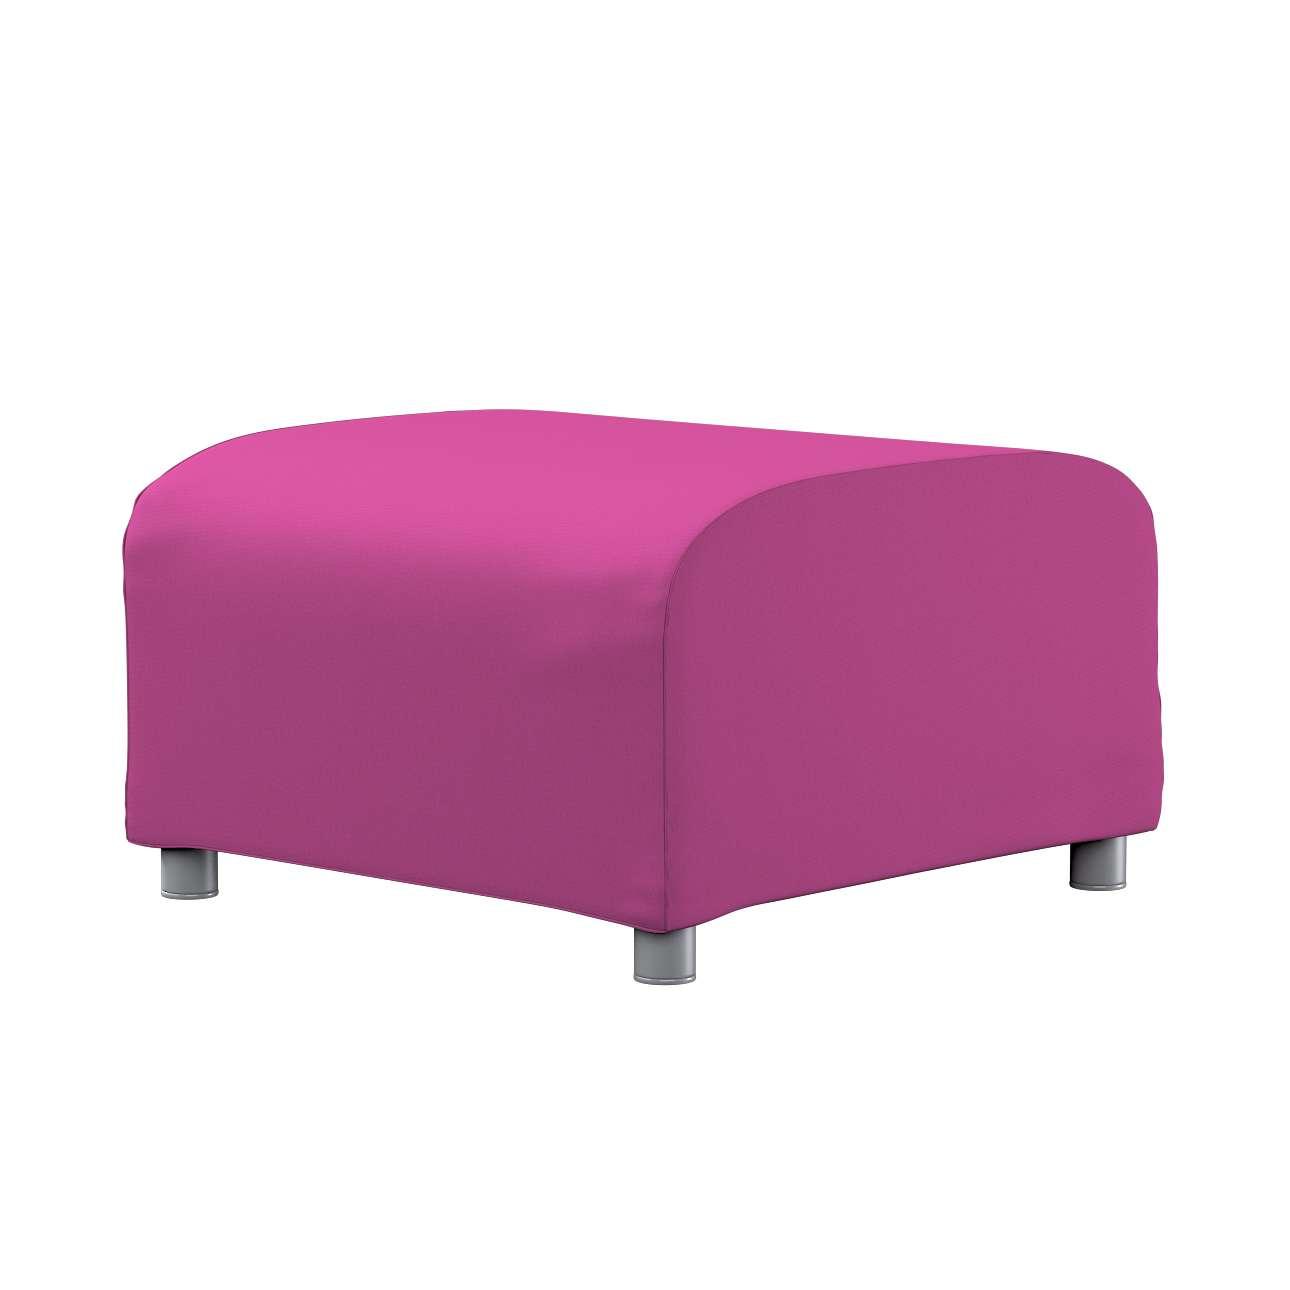 KLIPPAN pufo užvalkalas Klippan footstool cover kolekcijoje Etna , audinys: 705-23